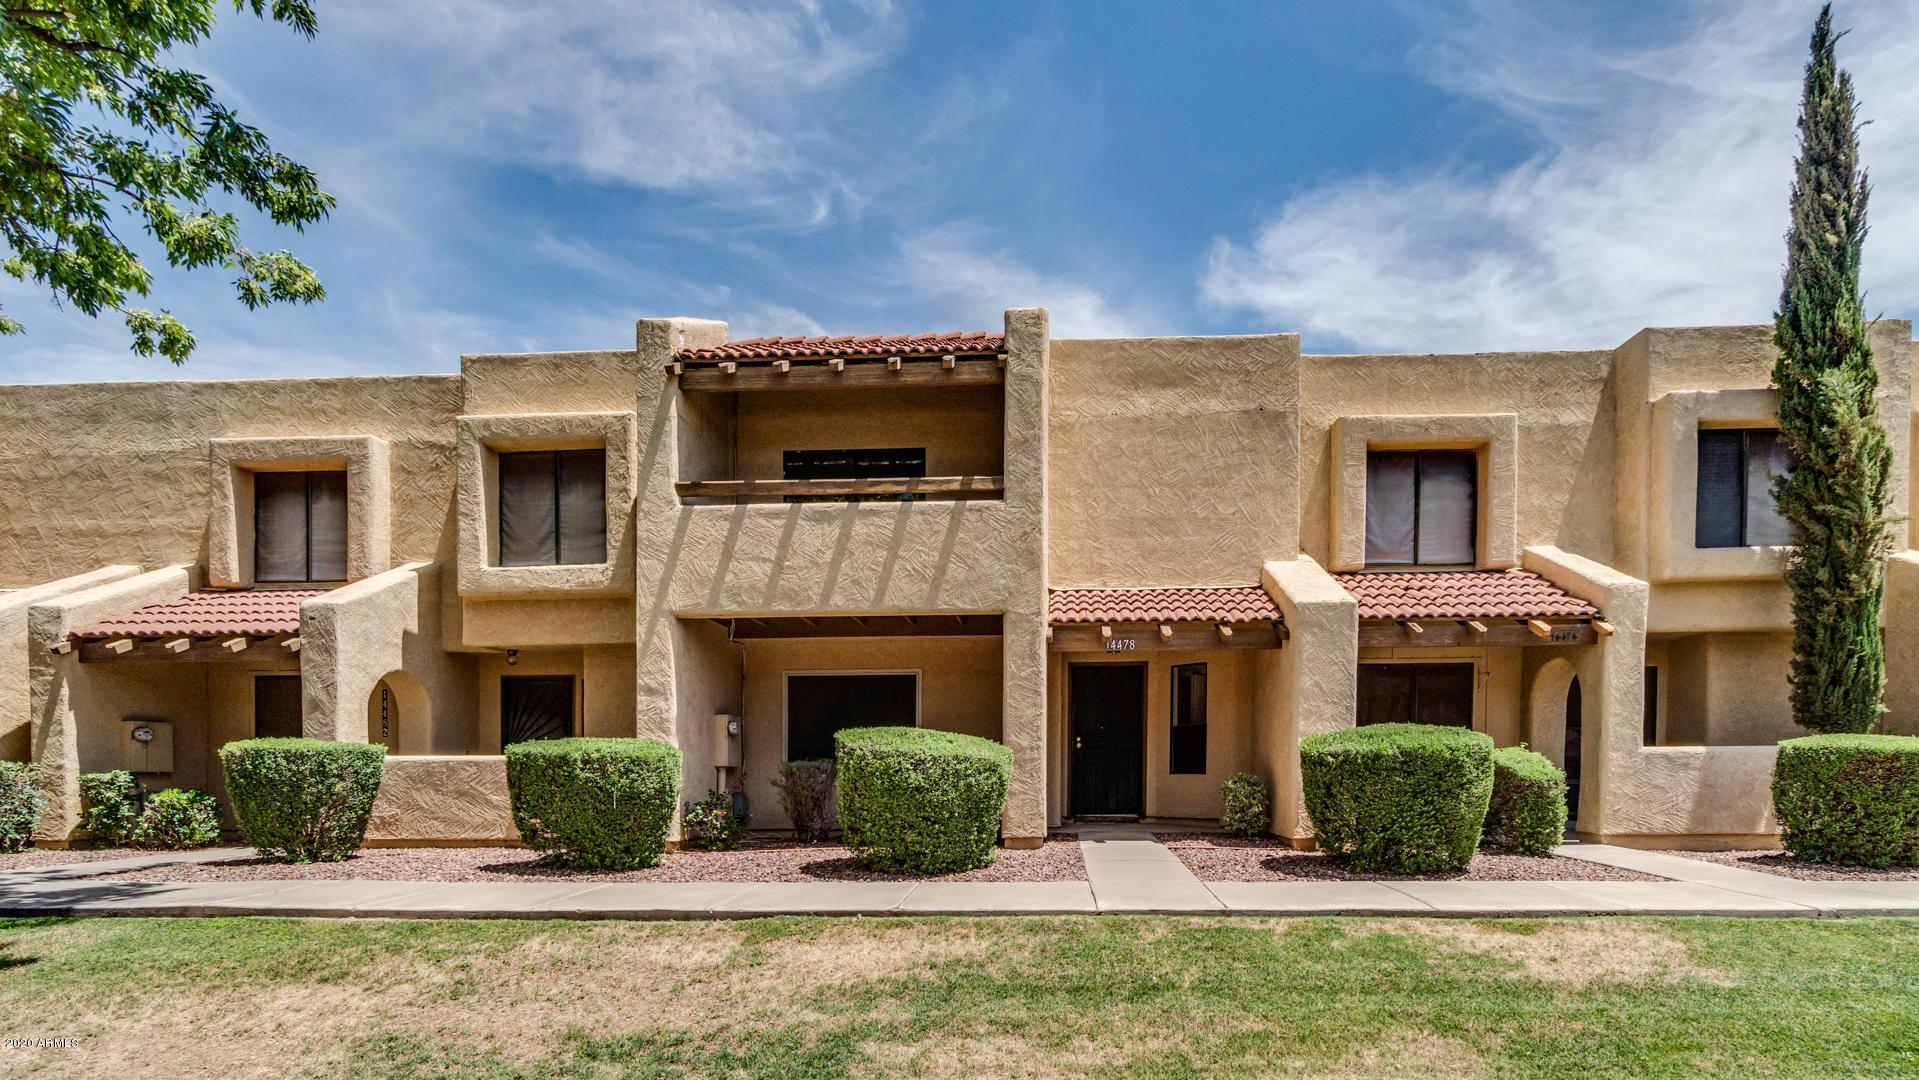 Photo of 14478 N 57TH Avenue, Glendale, AZ 85306